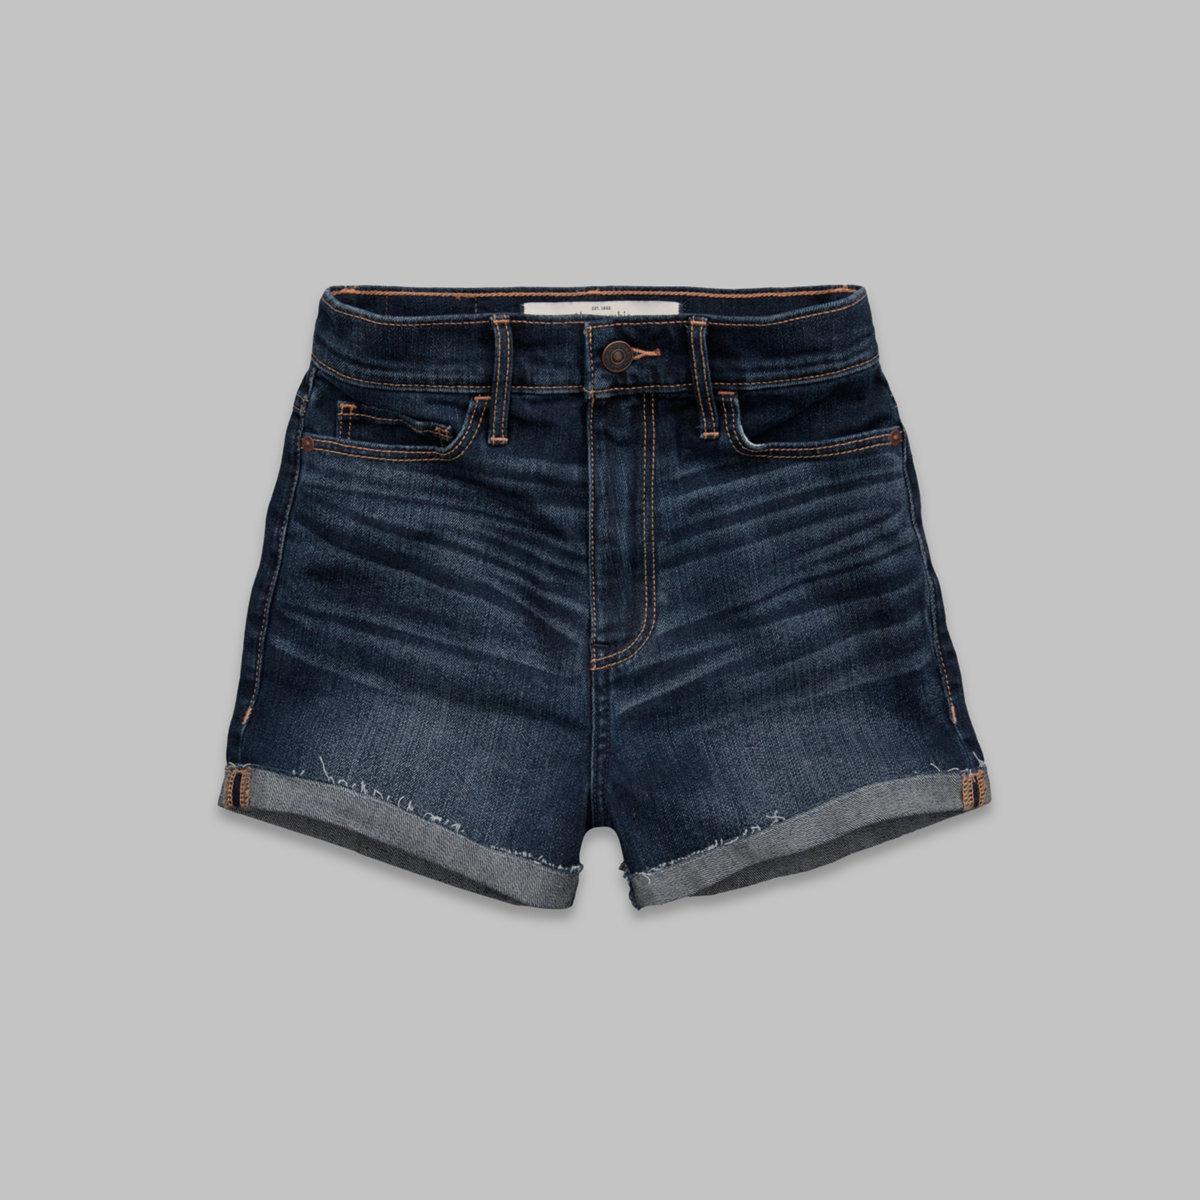 A&F Natural Waist Short Shorts